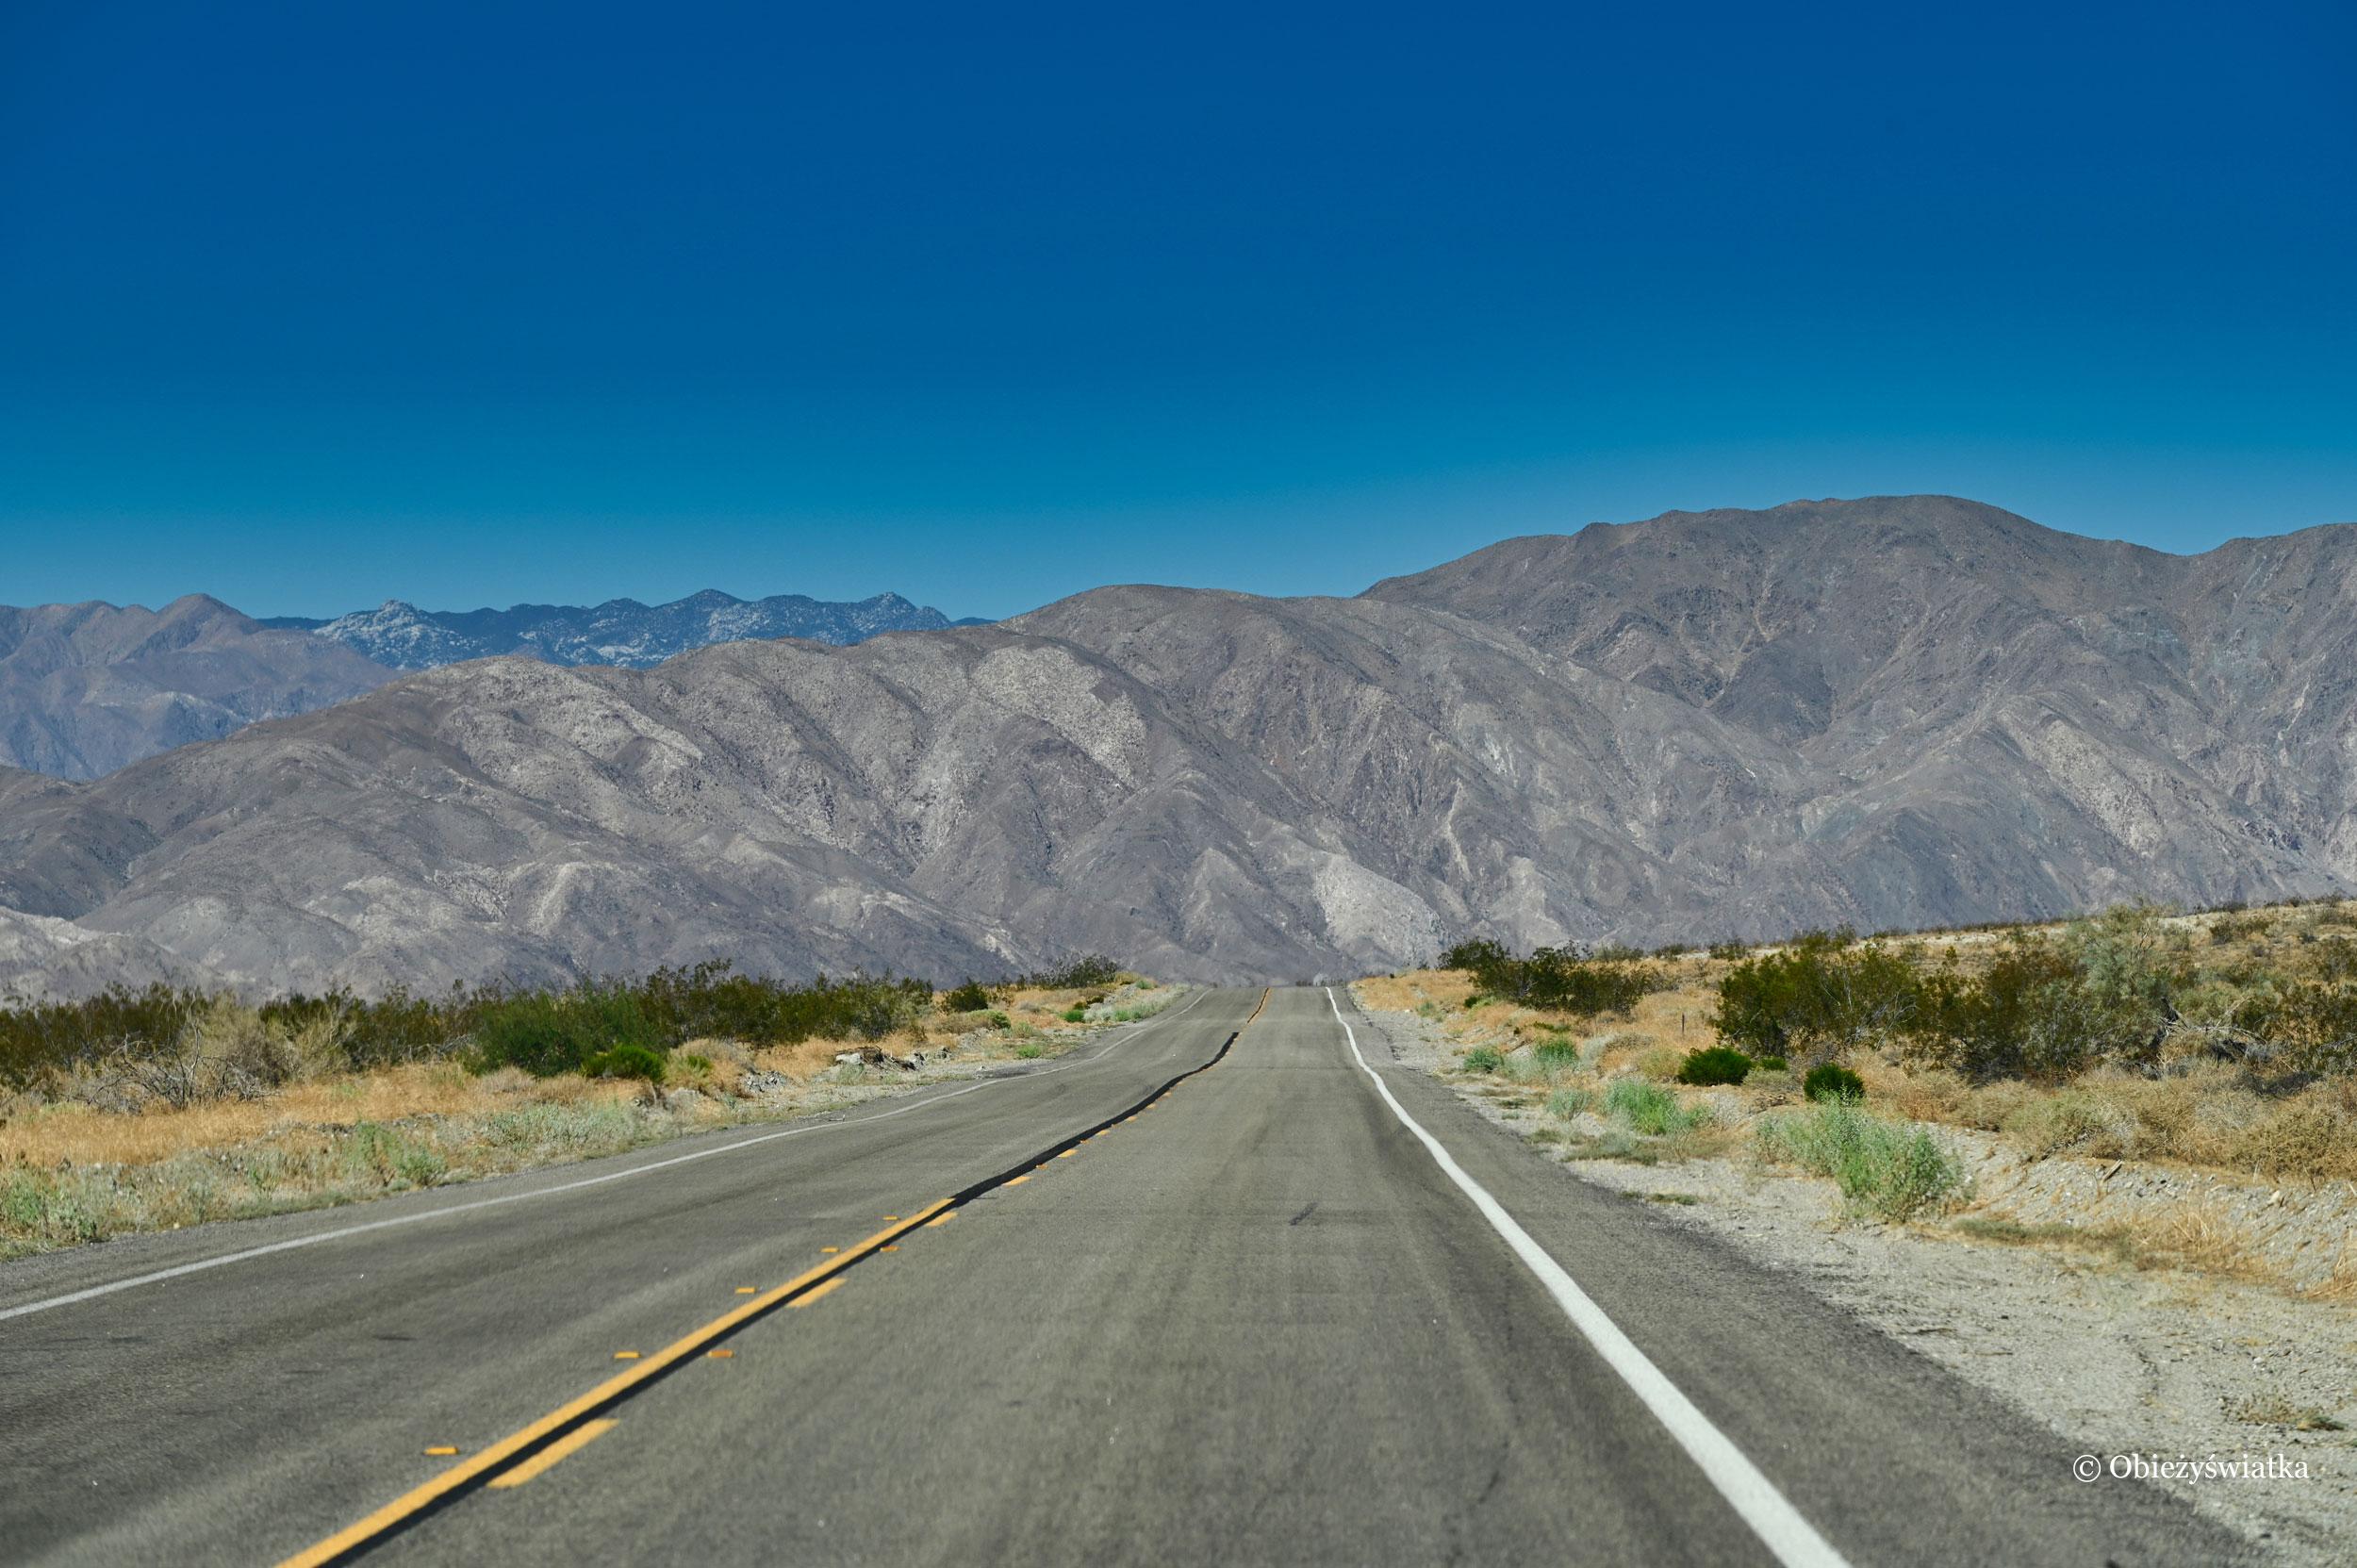 Droga do Borrego Springs przez Anza Borrego Desert State Park, Kalifornia